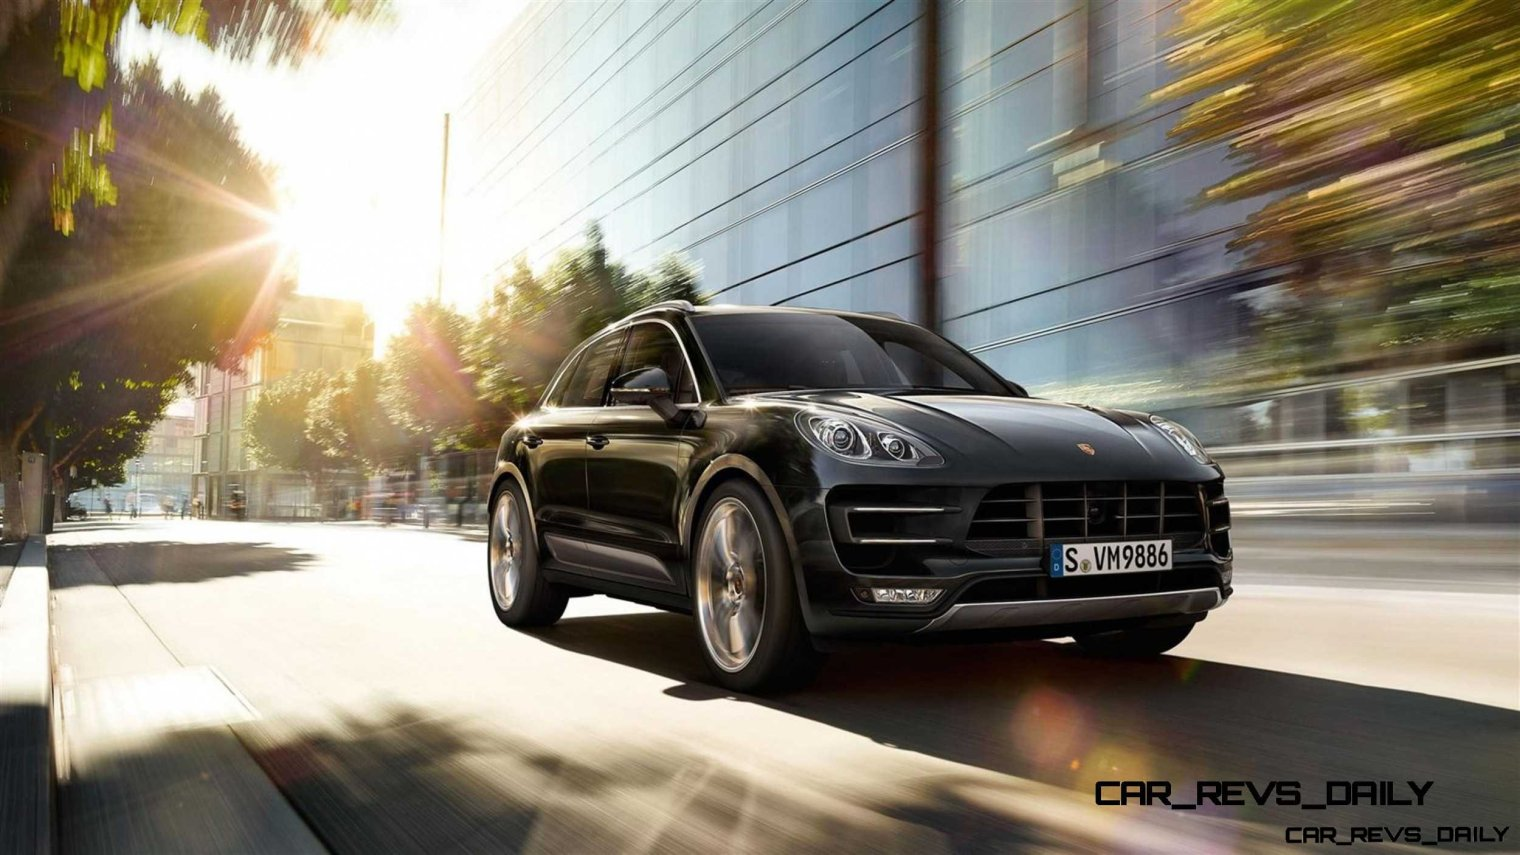 2015 Porsche Macan - Latest Images - CarRevsDaily.com 25